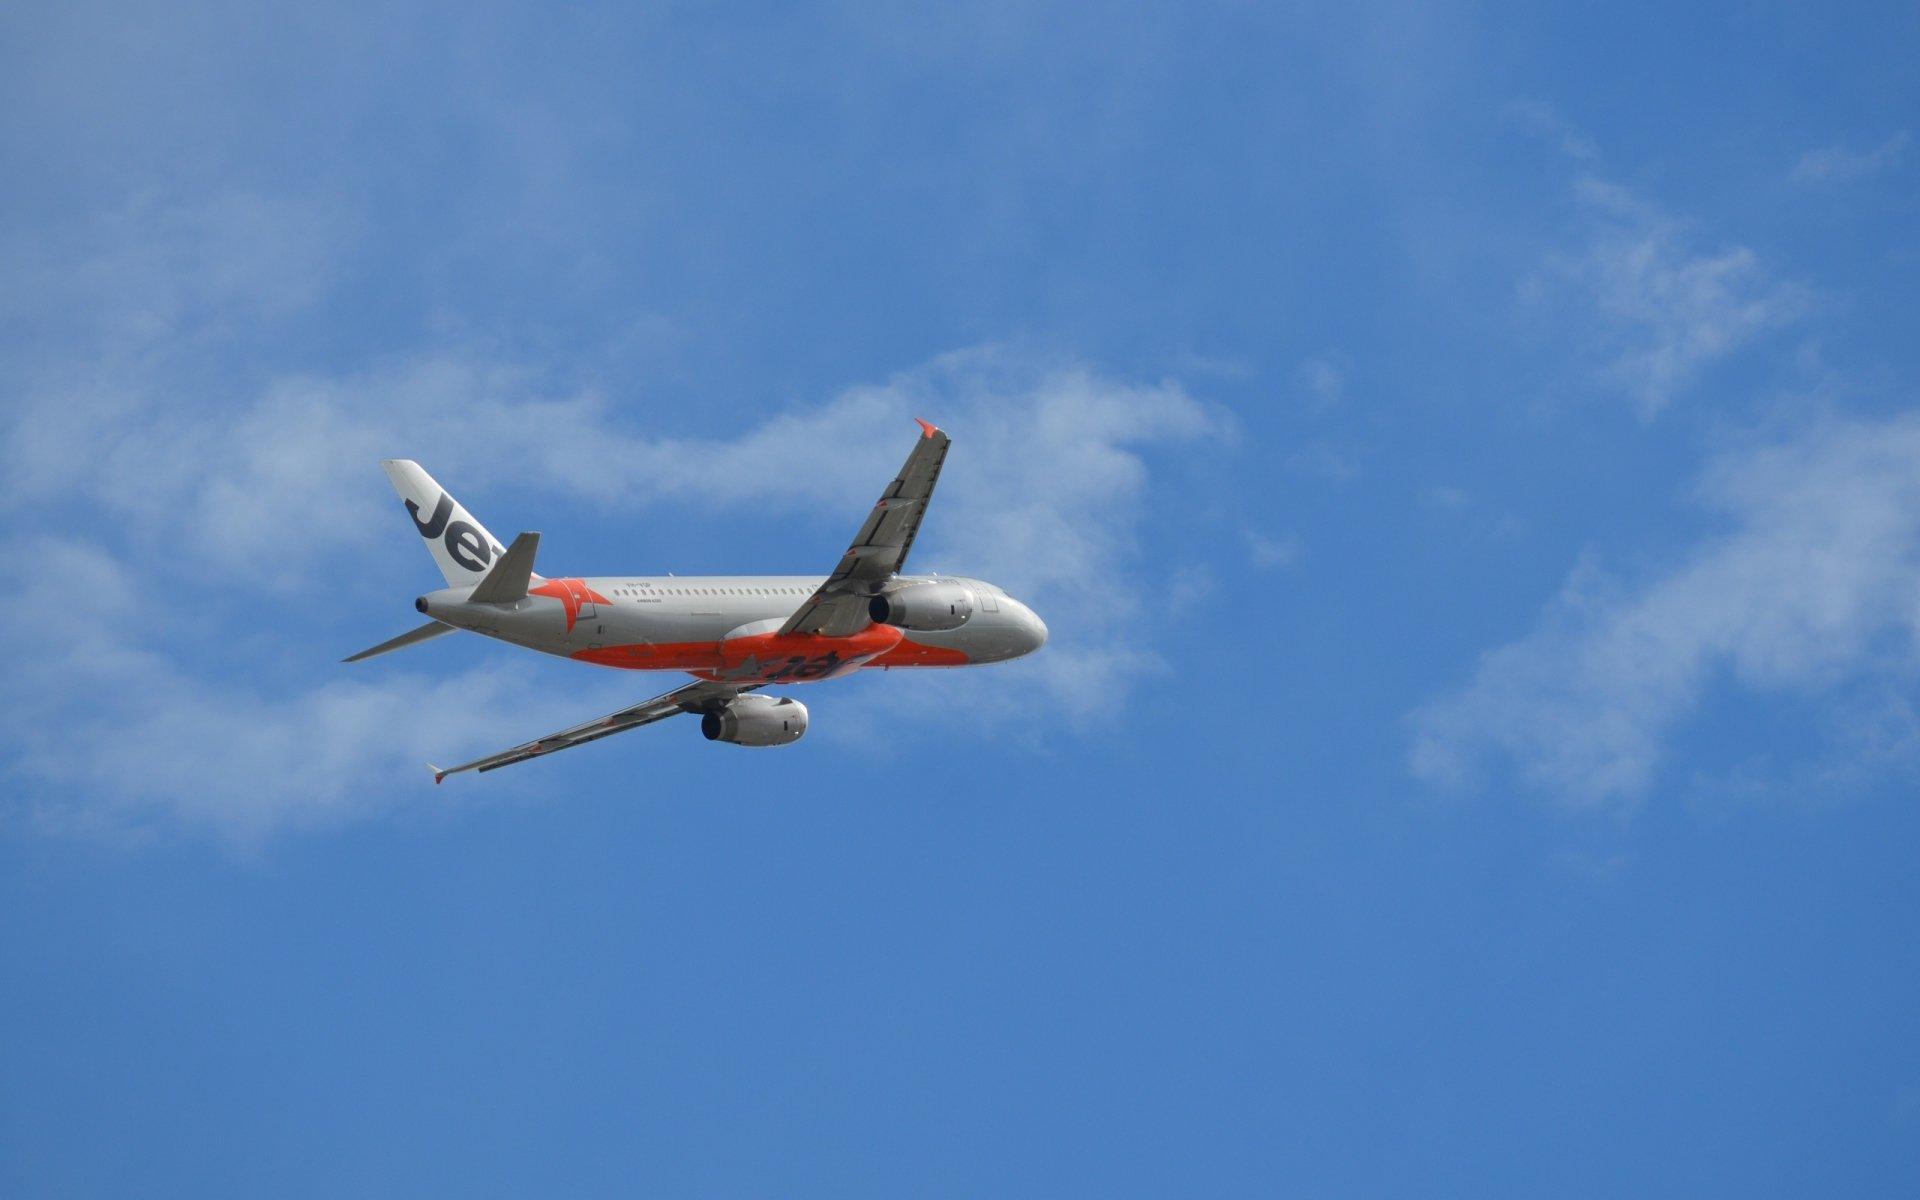 Airplane Wallpaper Iphone X Jetstar Airways A320 232 Over Sydney Airport Hd Wallpaper